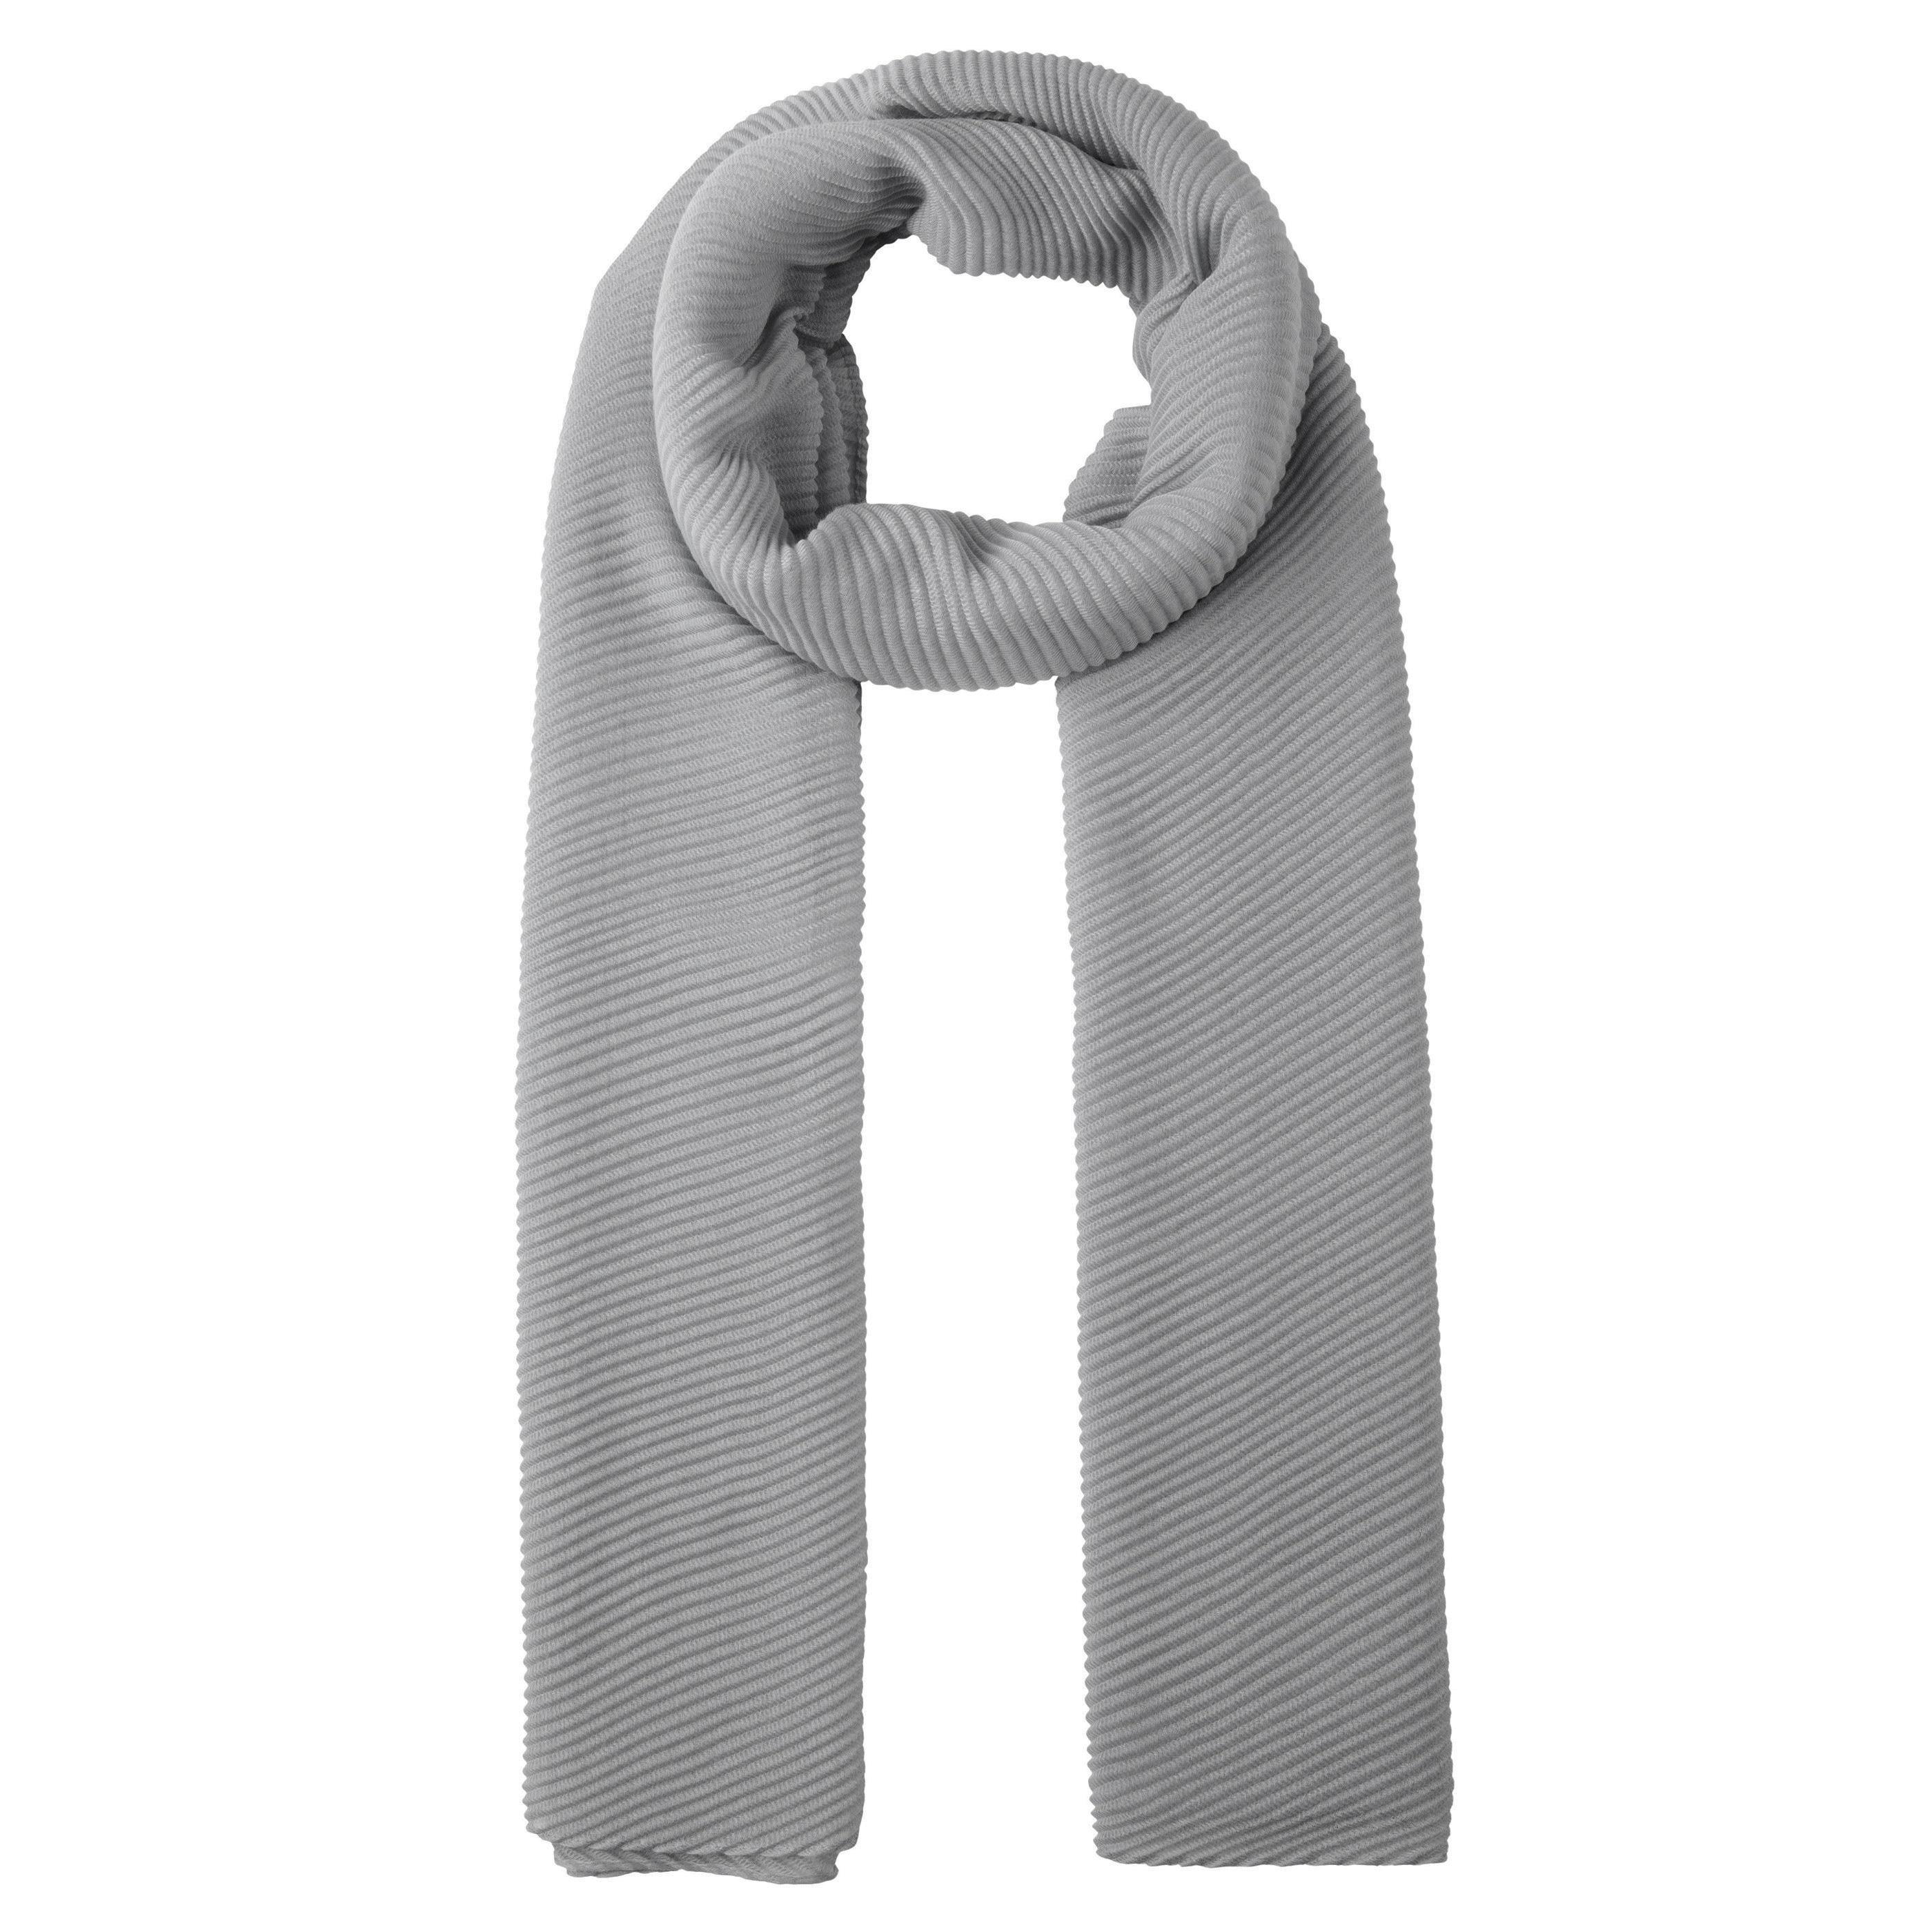 codello -  Schal, mit coolem Retro-Print aus recyceltem Polyester